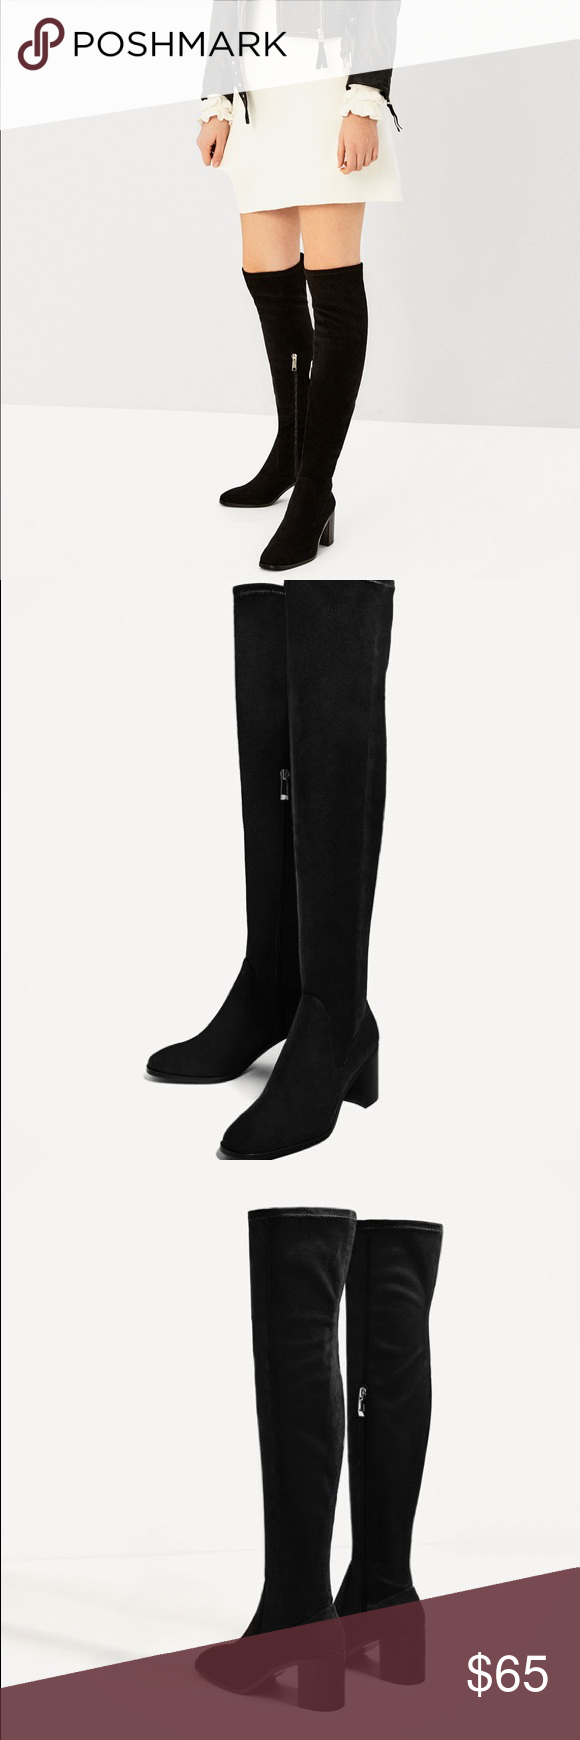 Zara Stretch High Heel Over The Knee Boots Boots Over The Knee Boots High Heels